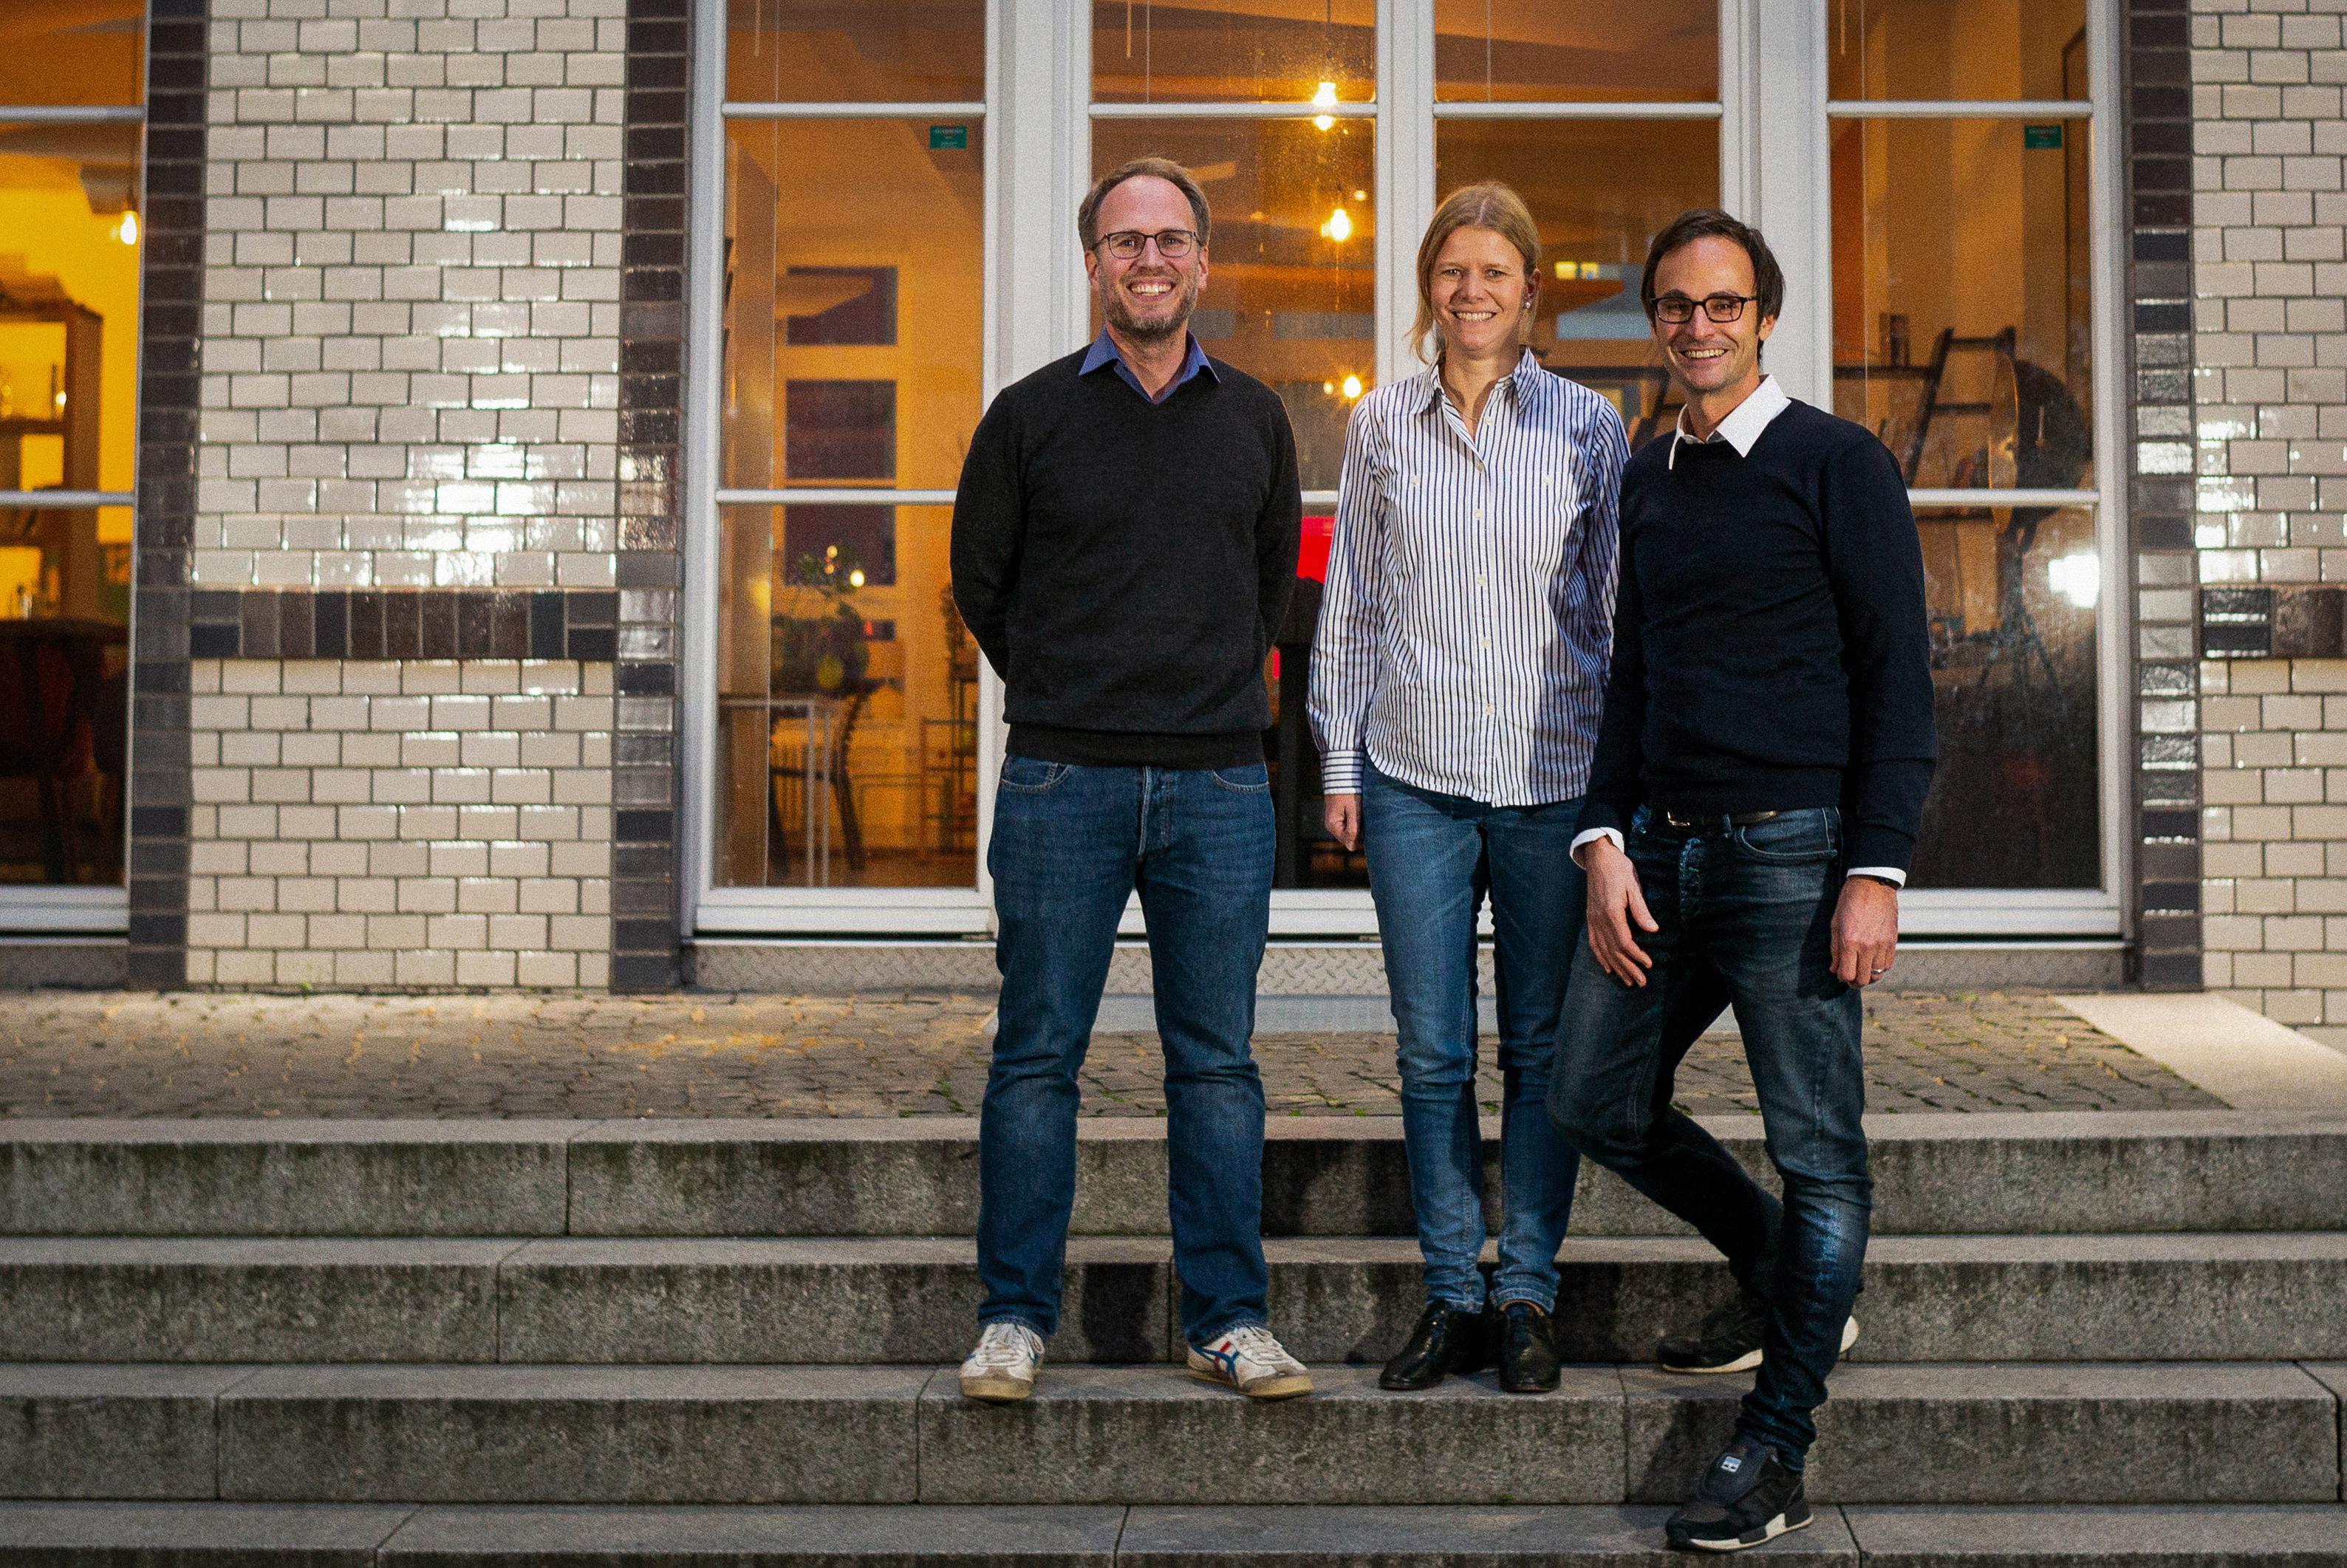 Vorstand home24 firmenwebsite for Home24 karriere